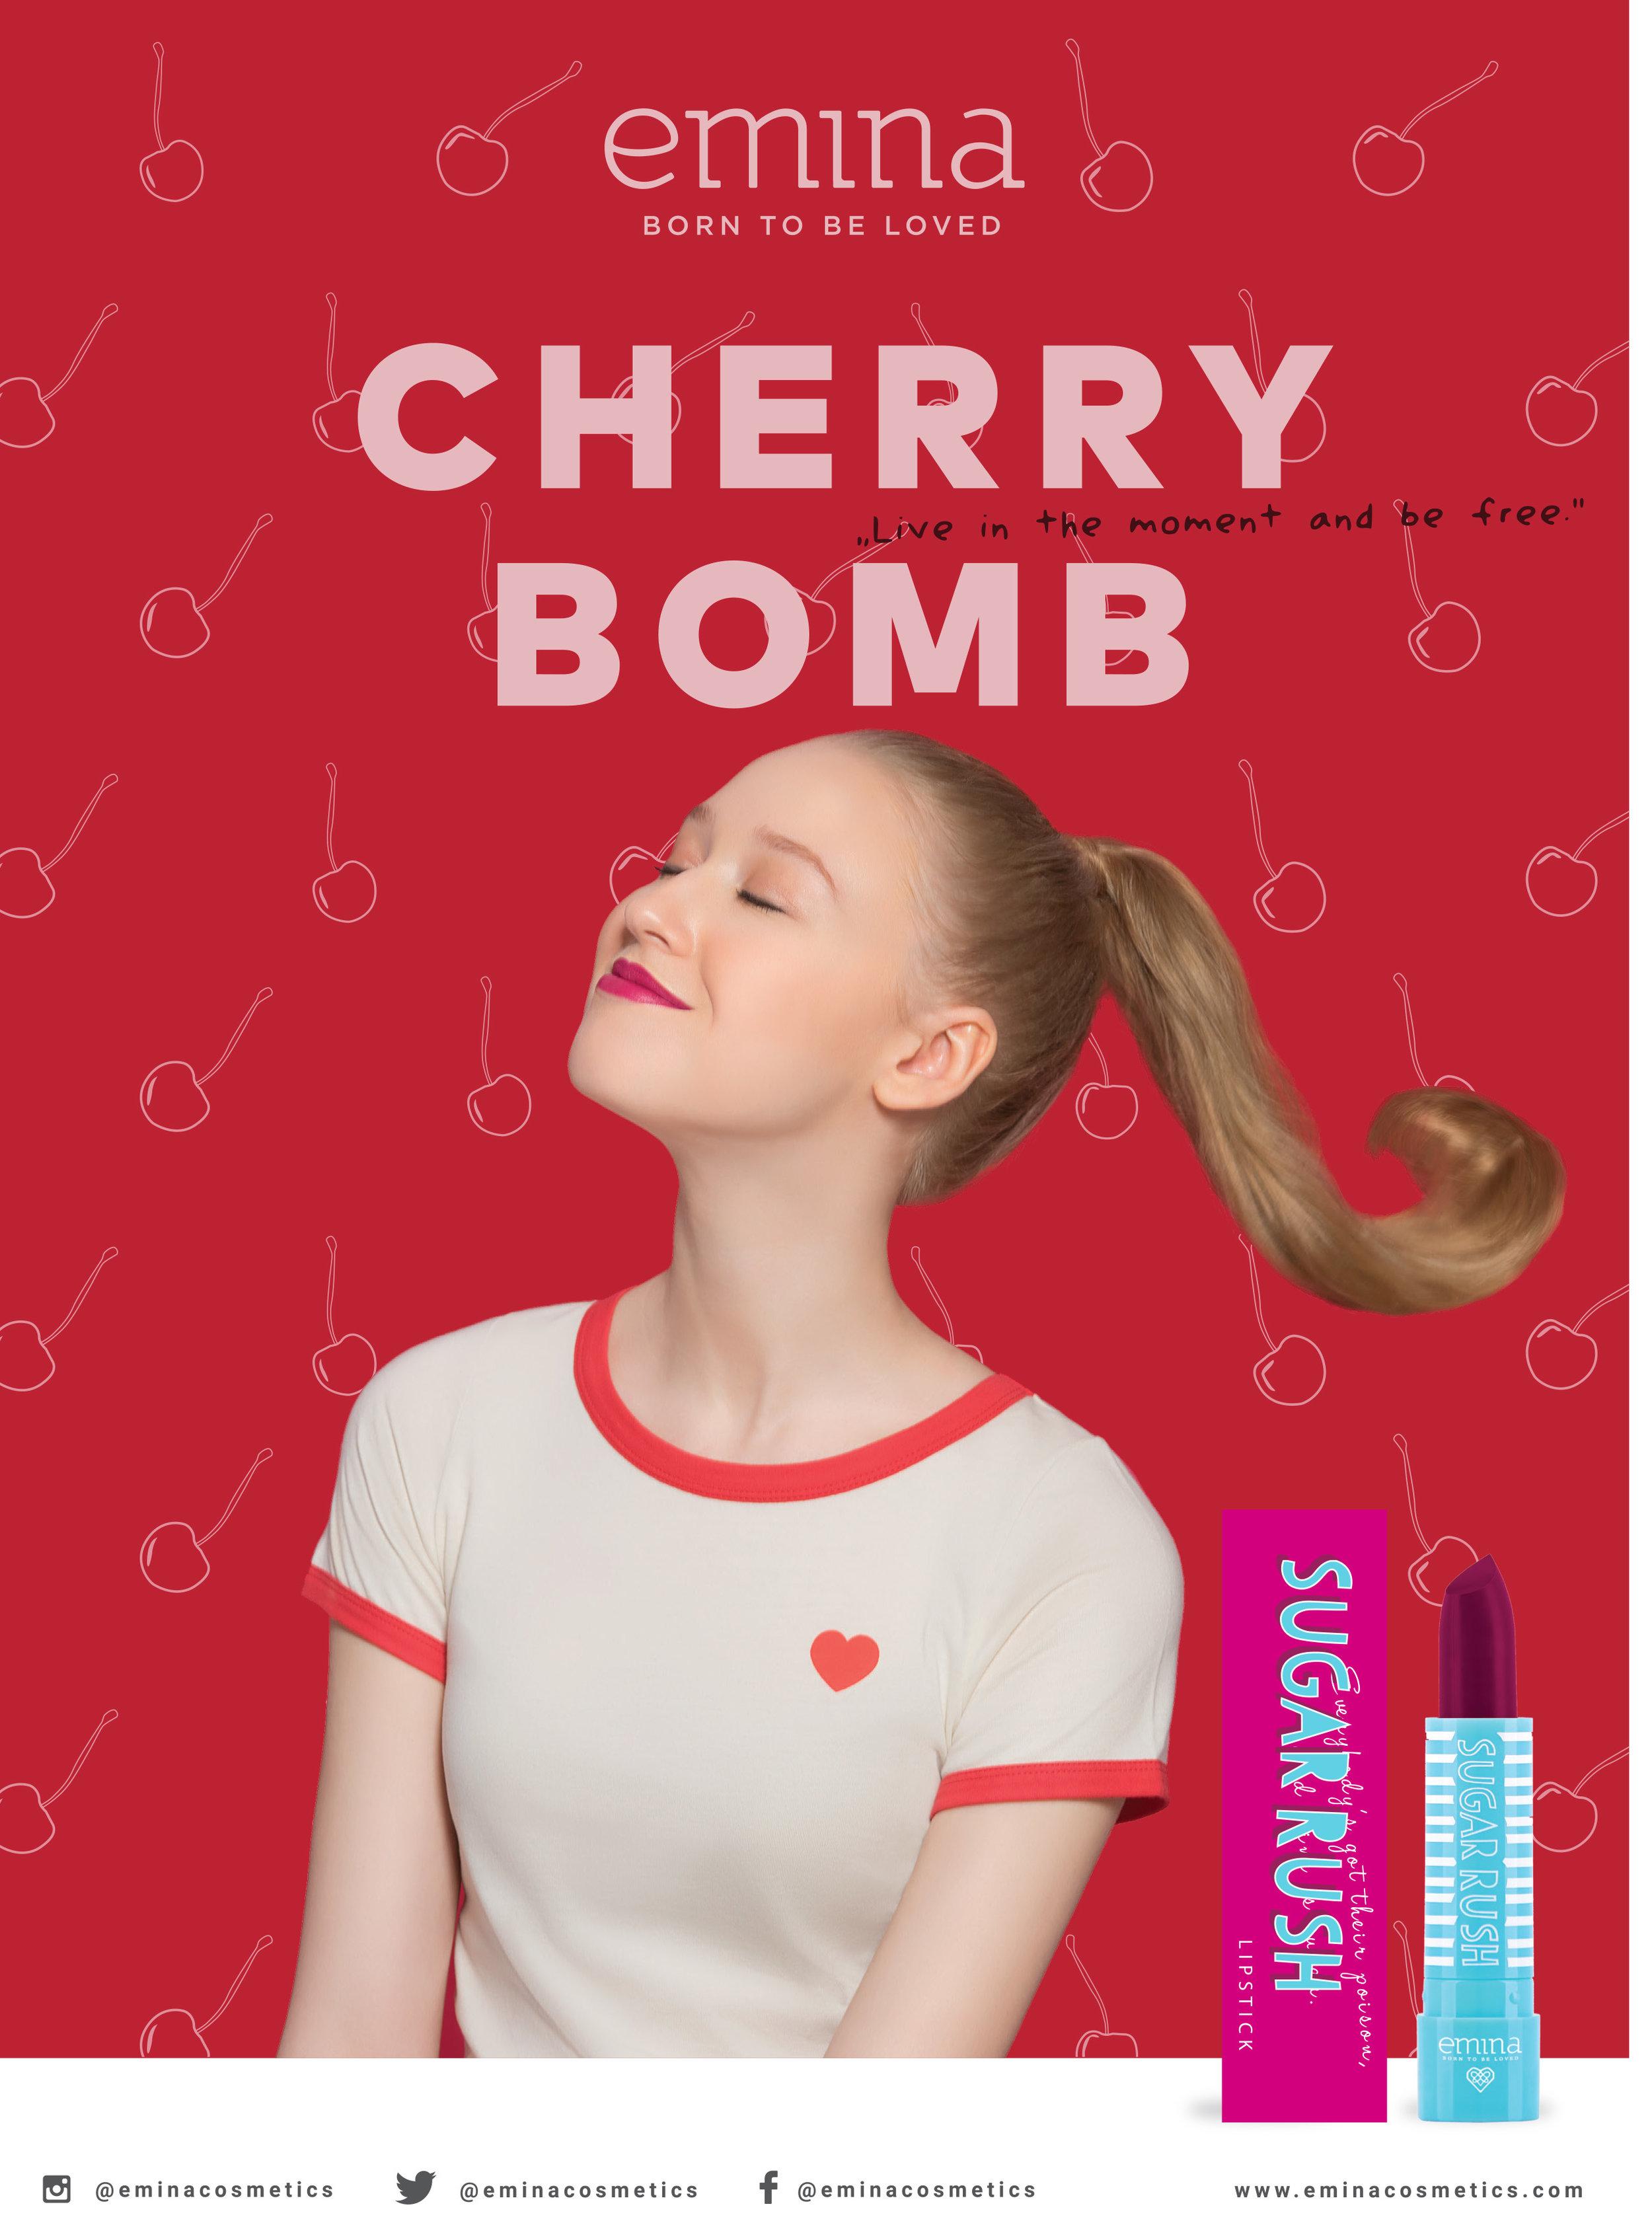 EMINA _PRINT ADS sugar rush (cherry bomb) FA11.jpg